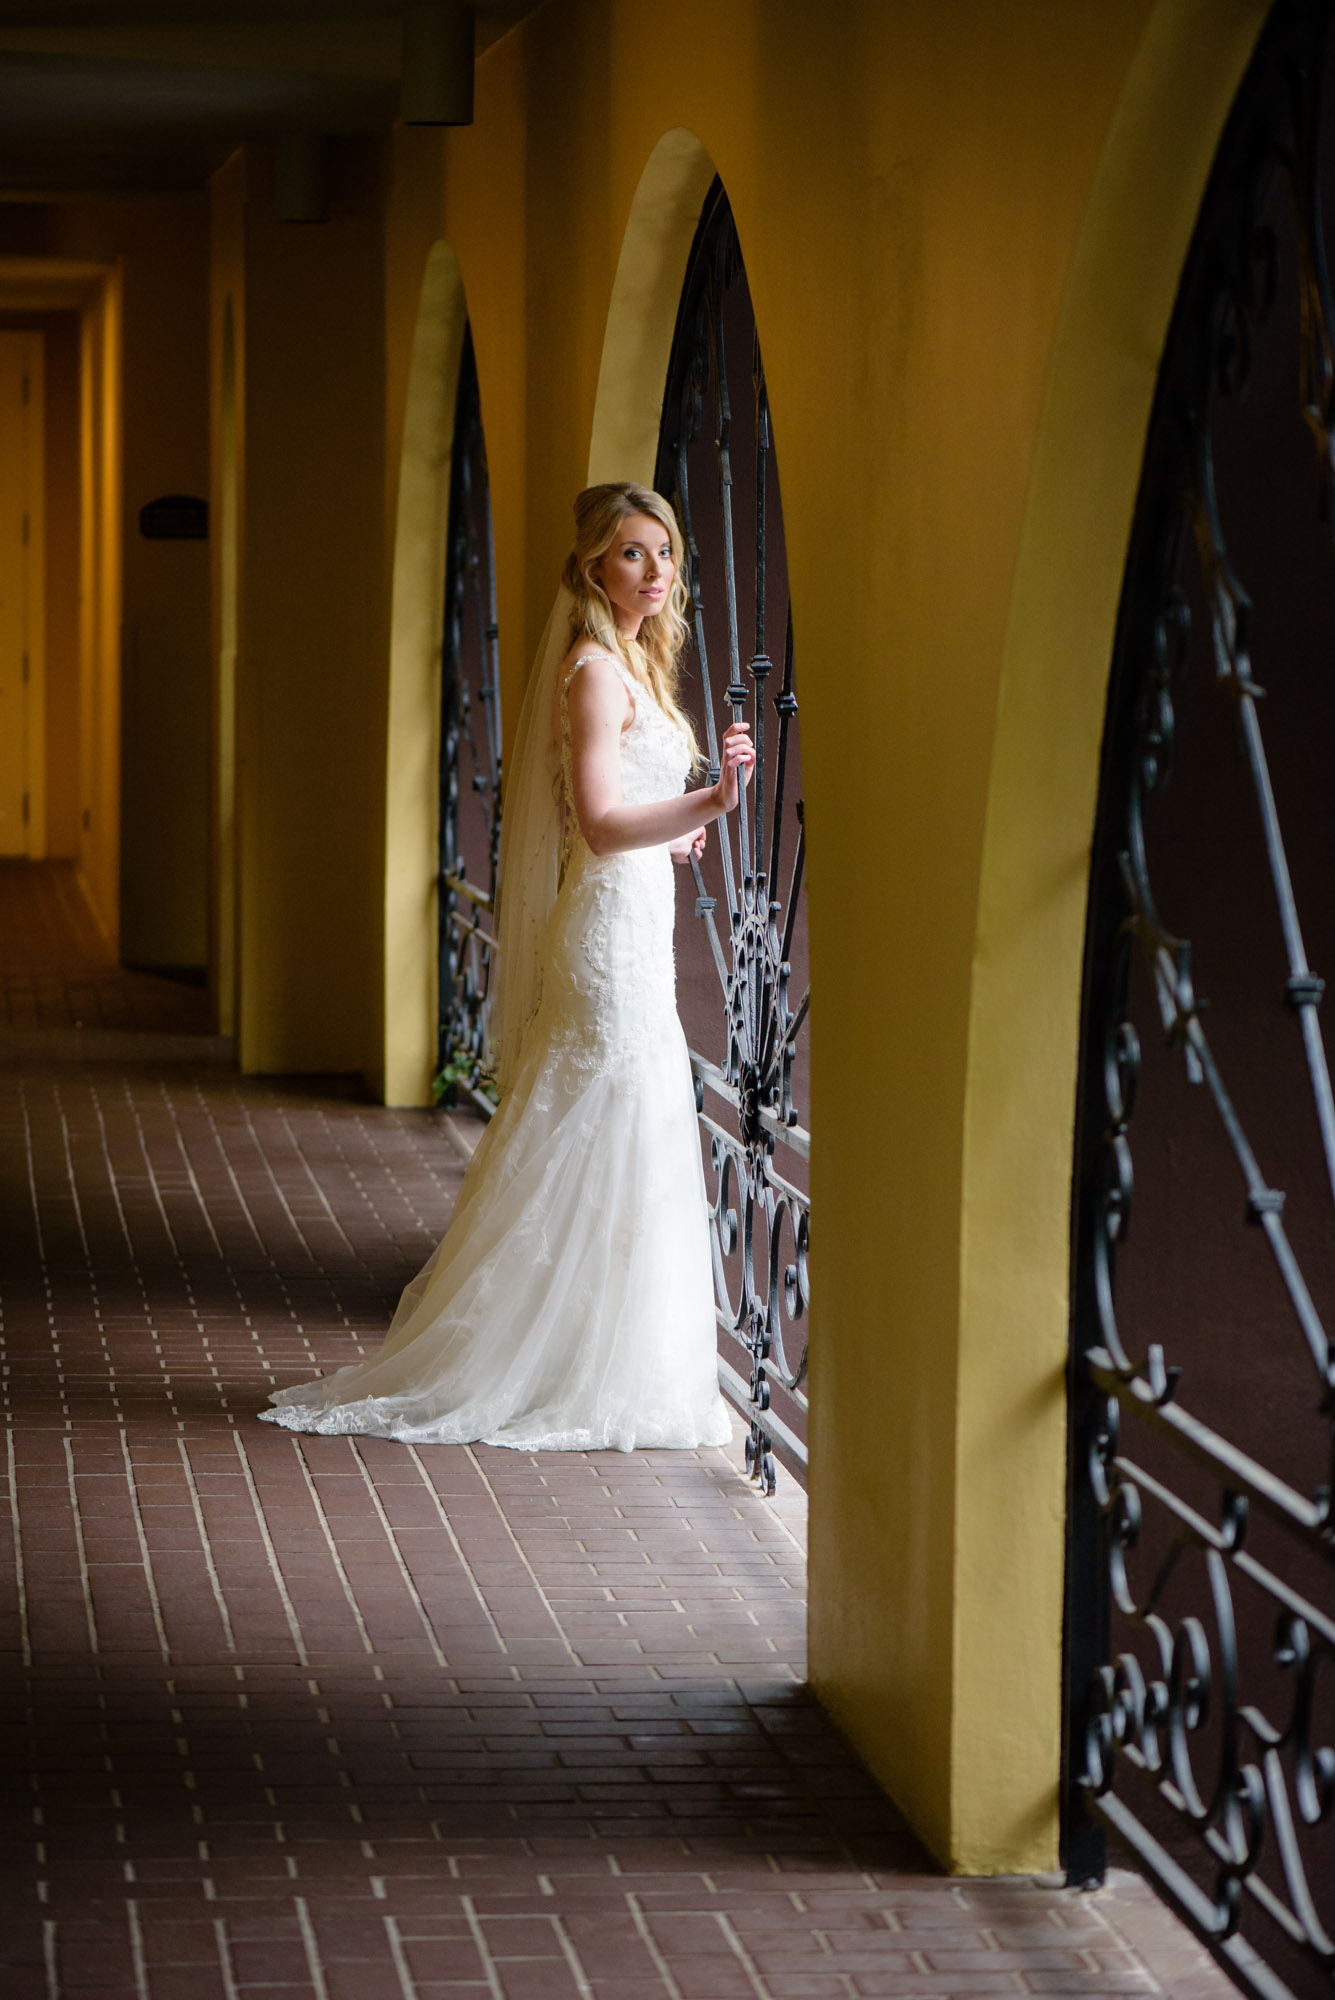 Natural light portrait at New Orleans' Hotel Mazarin